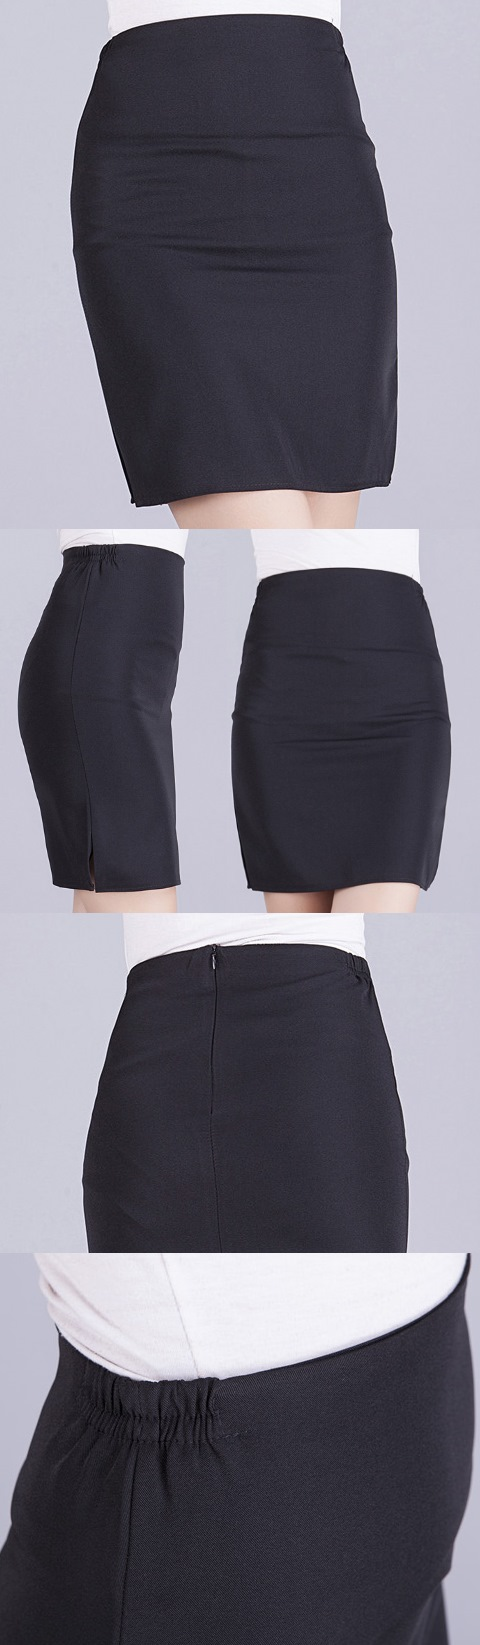 Restaurant Uniform - Waitress Skirt (Black)